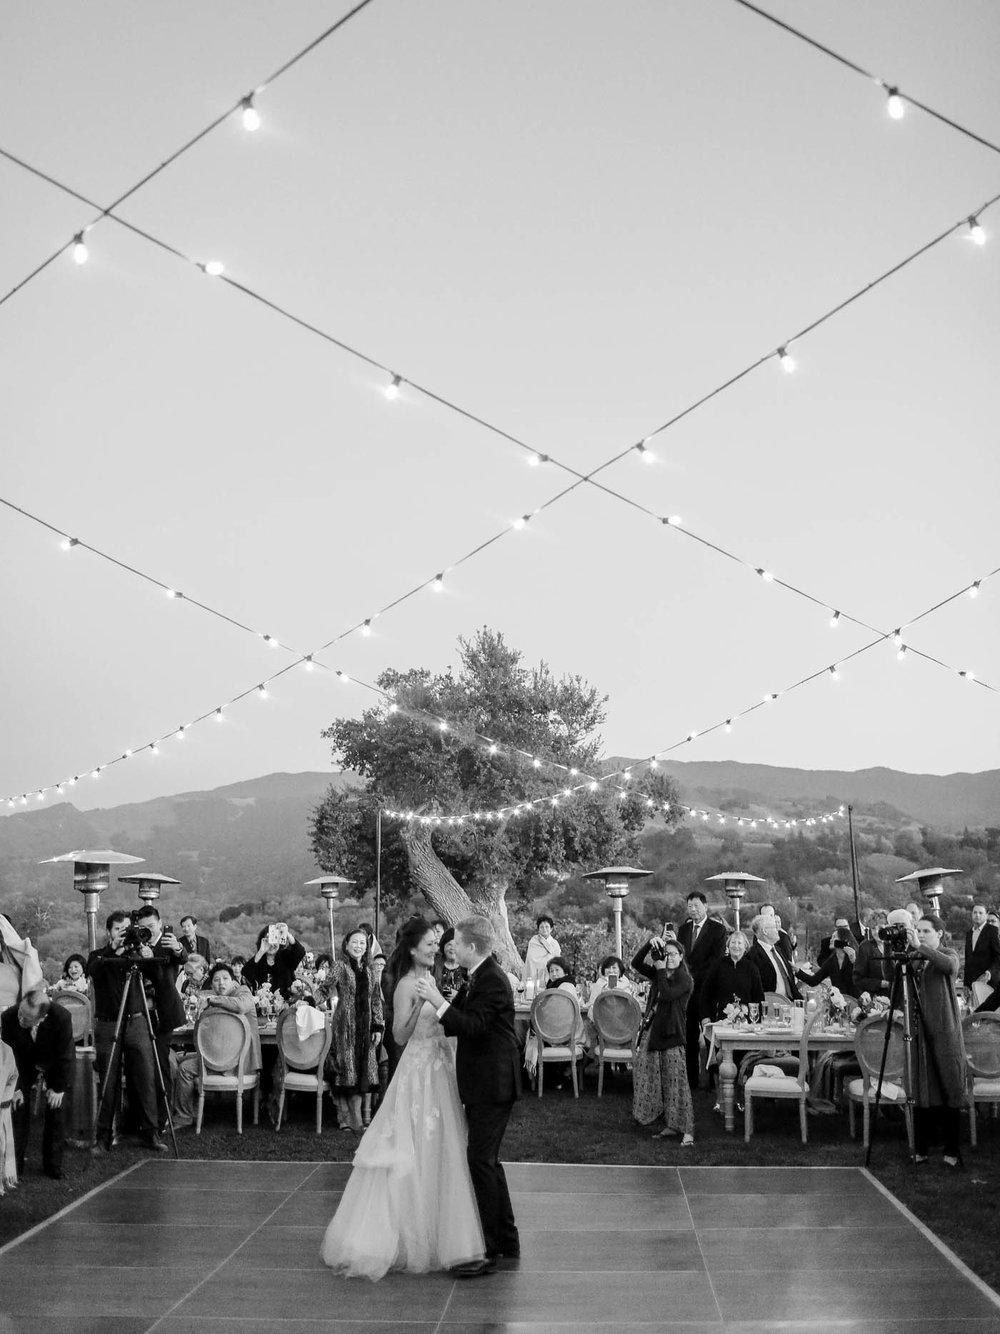 sunstone-villa-wedding-38-Jen_Huang-RD-192-Jen_Huang-JHP_4162.jpg